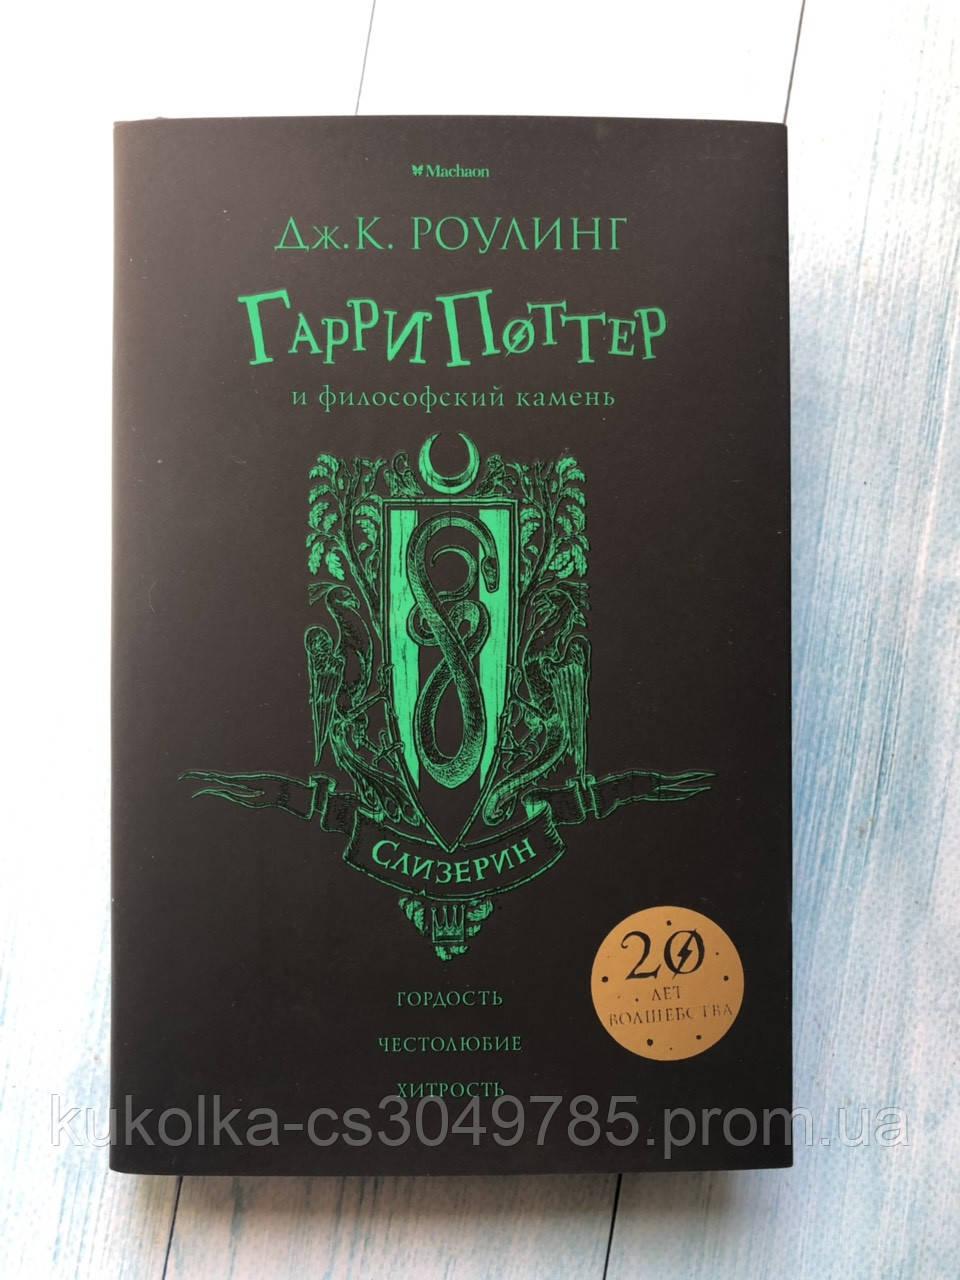 Книга Гарри Поттер и философский камень Слизерин Роулинг Дж.К. Махаон арт.9785389136243